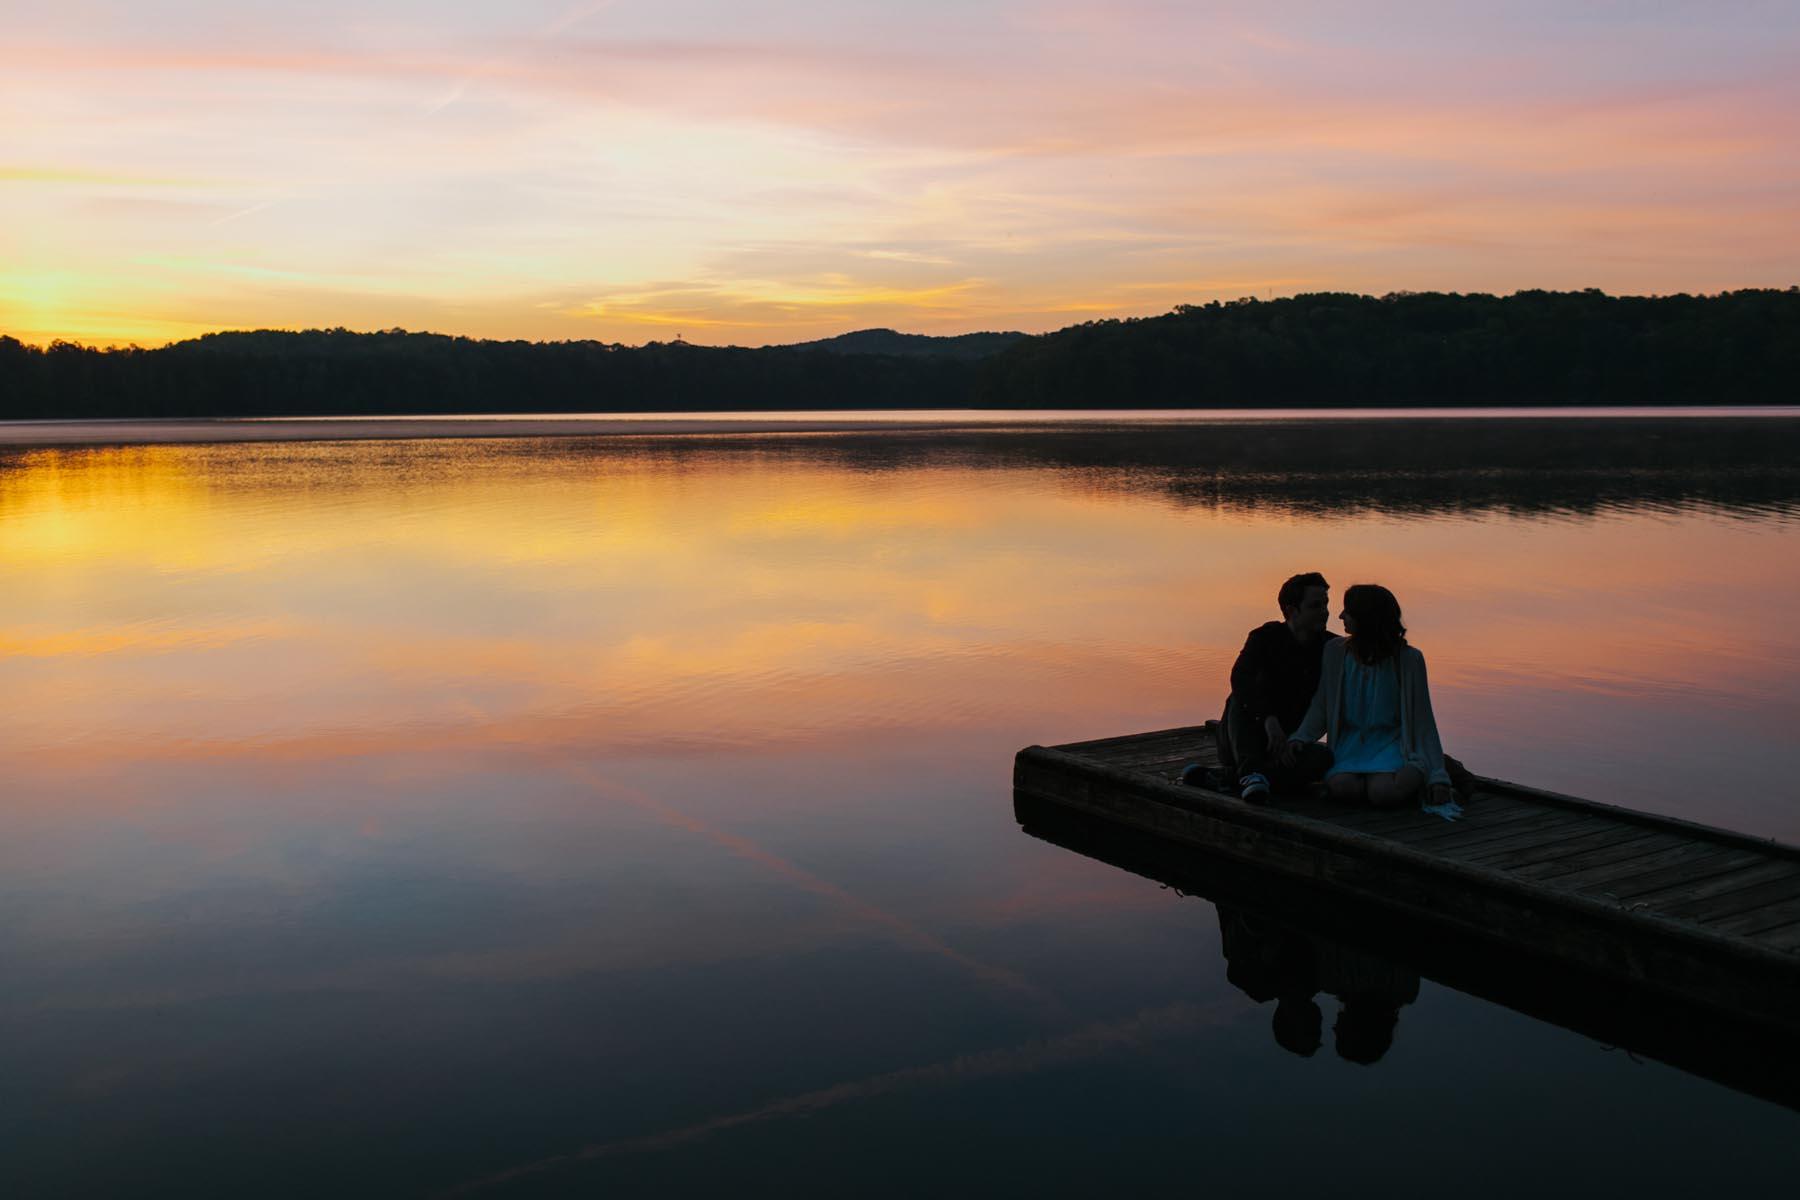 OneNine Images | Engagements Photographer | onenineimages.com